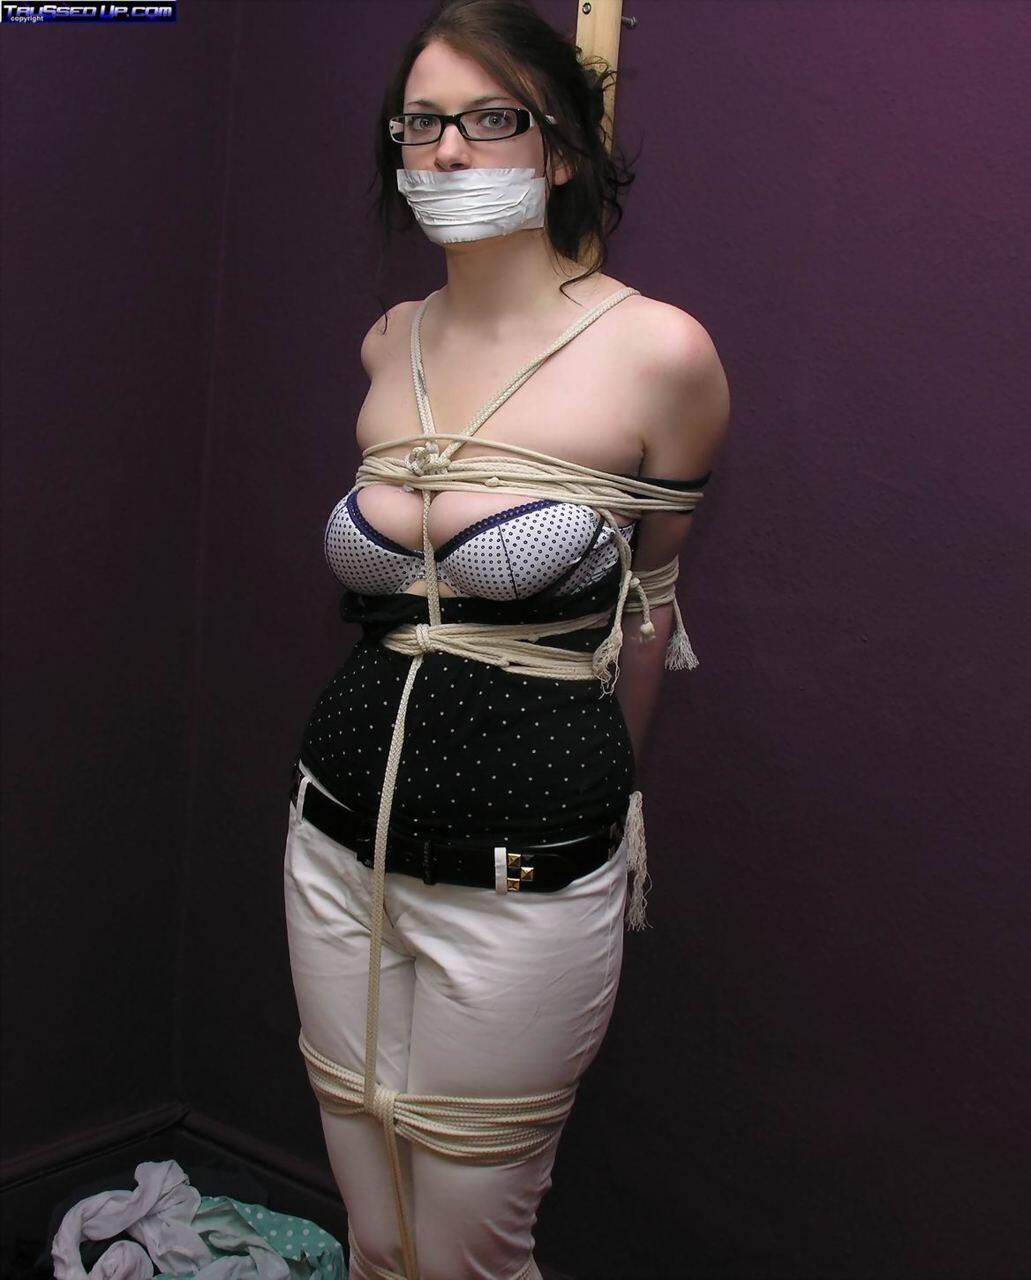 bondage girls wearing glasses naughty sub slut #girl #glasses #bondage #bdsm #slave http:/